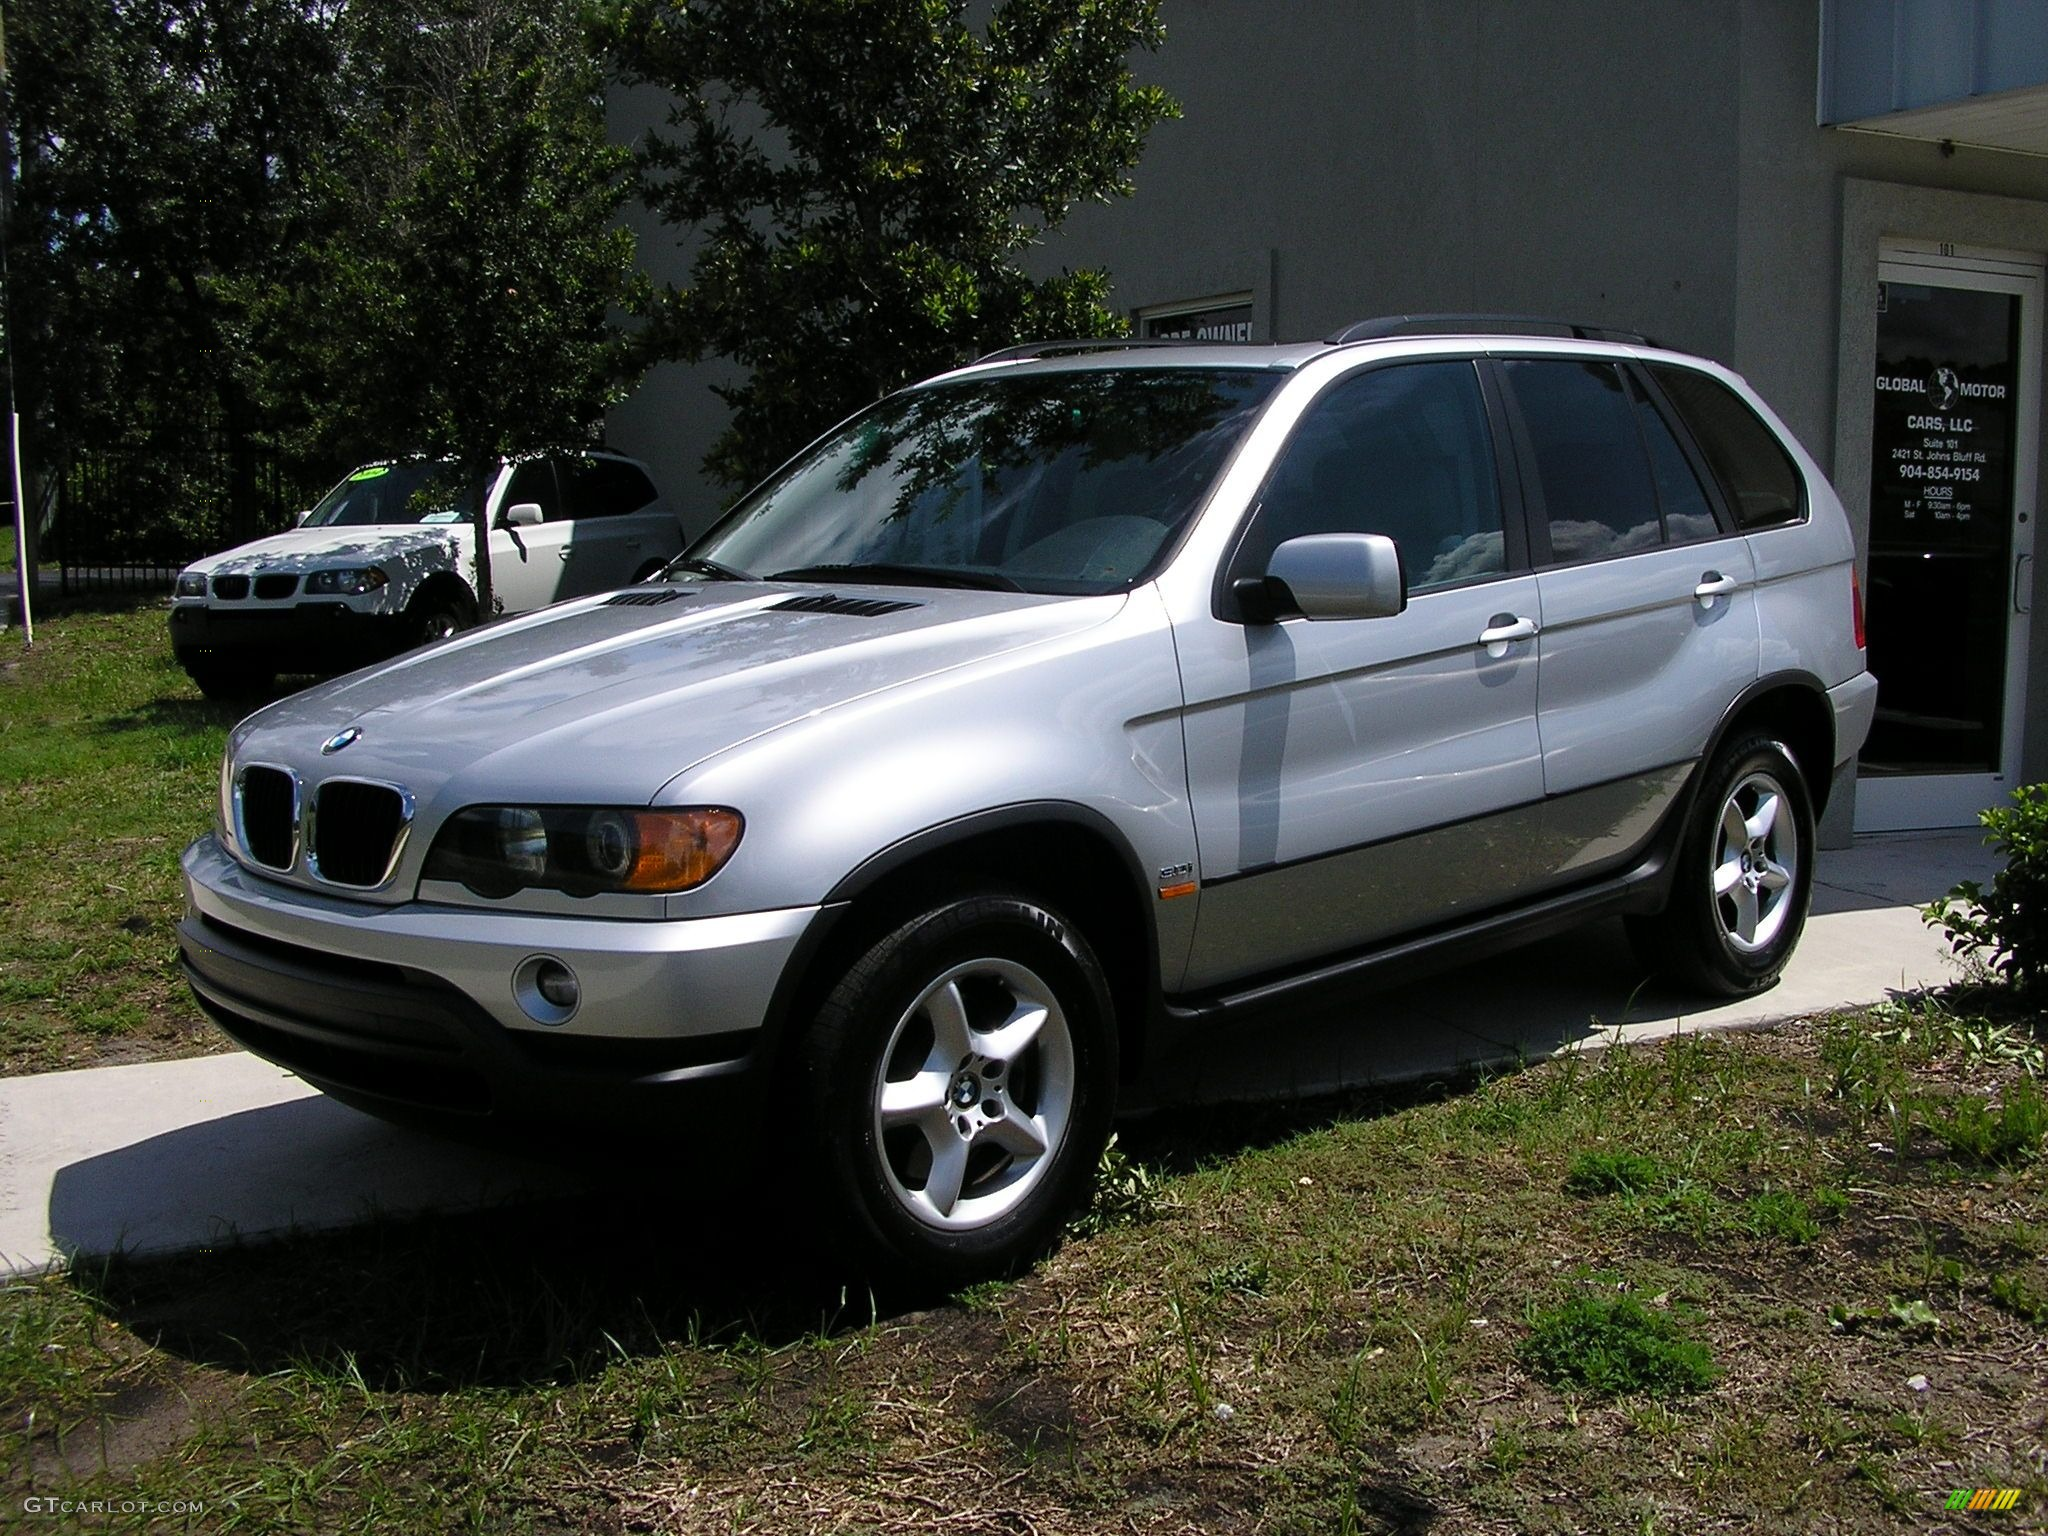 BMW X5 3.0 black